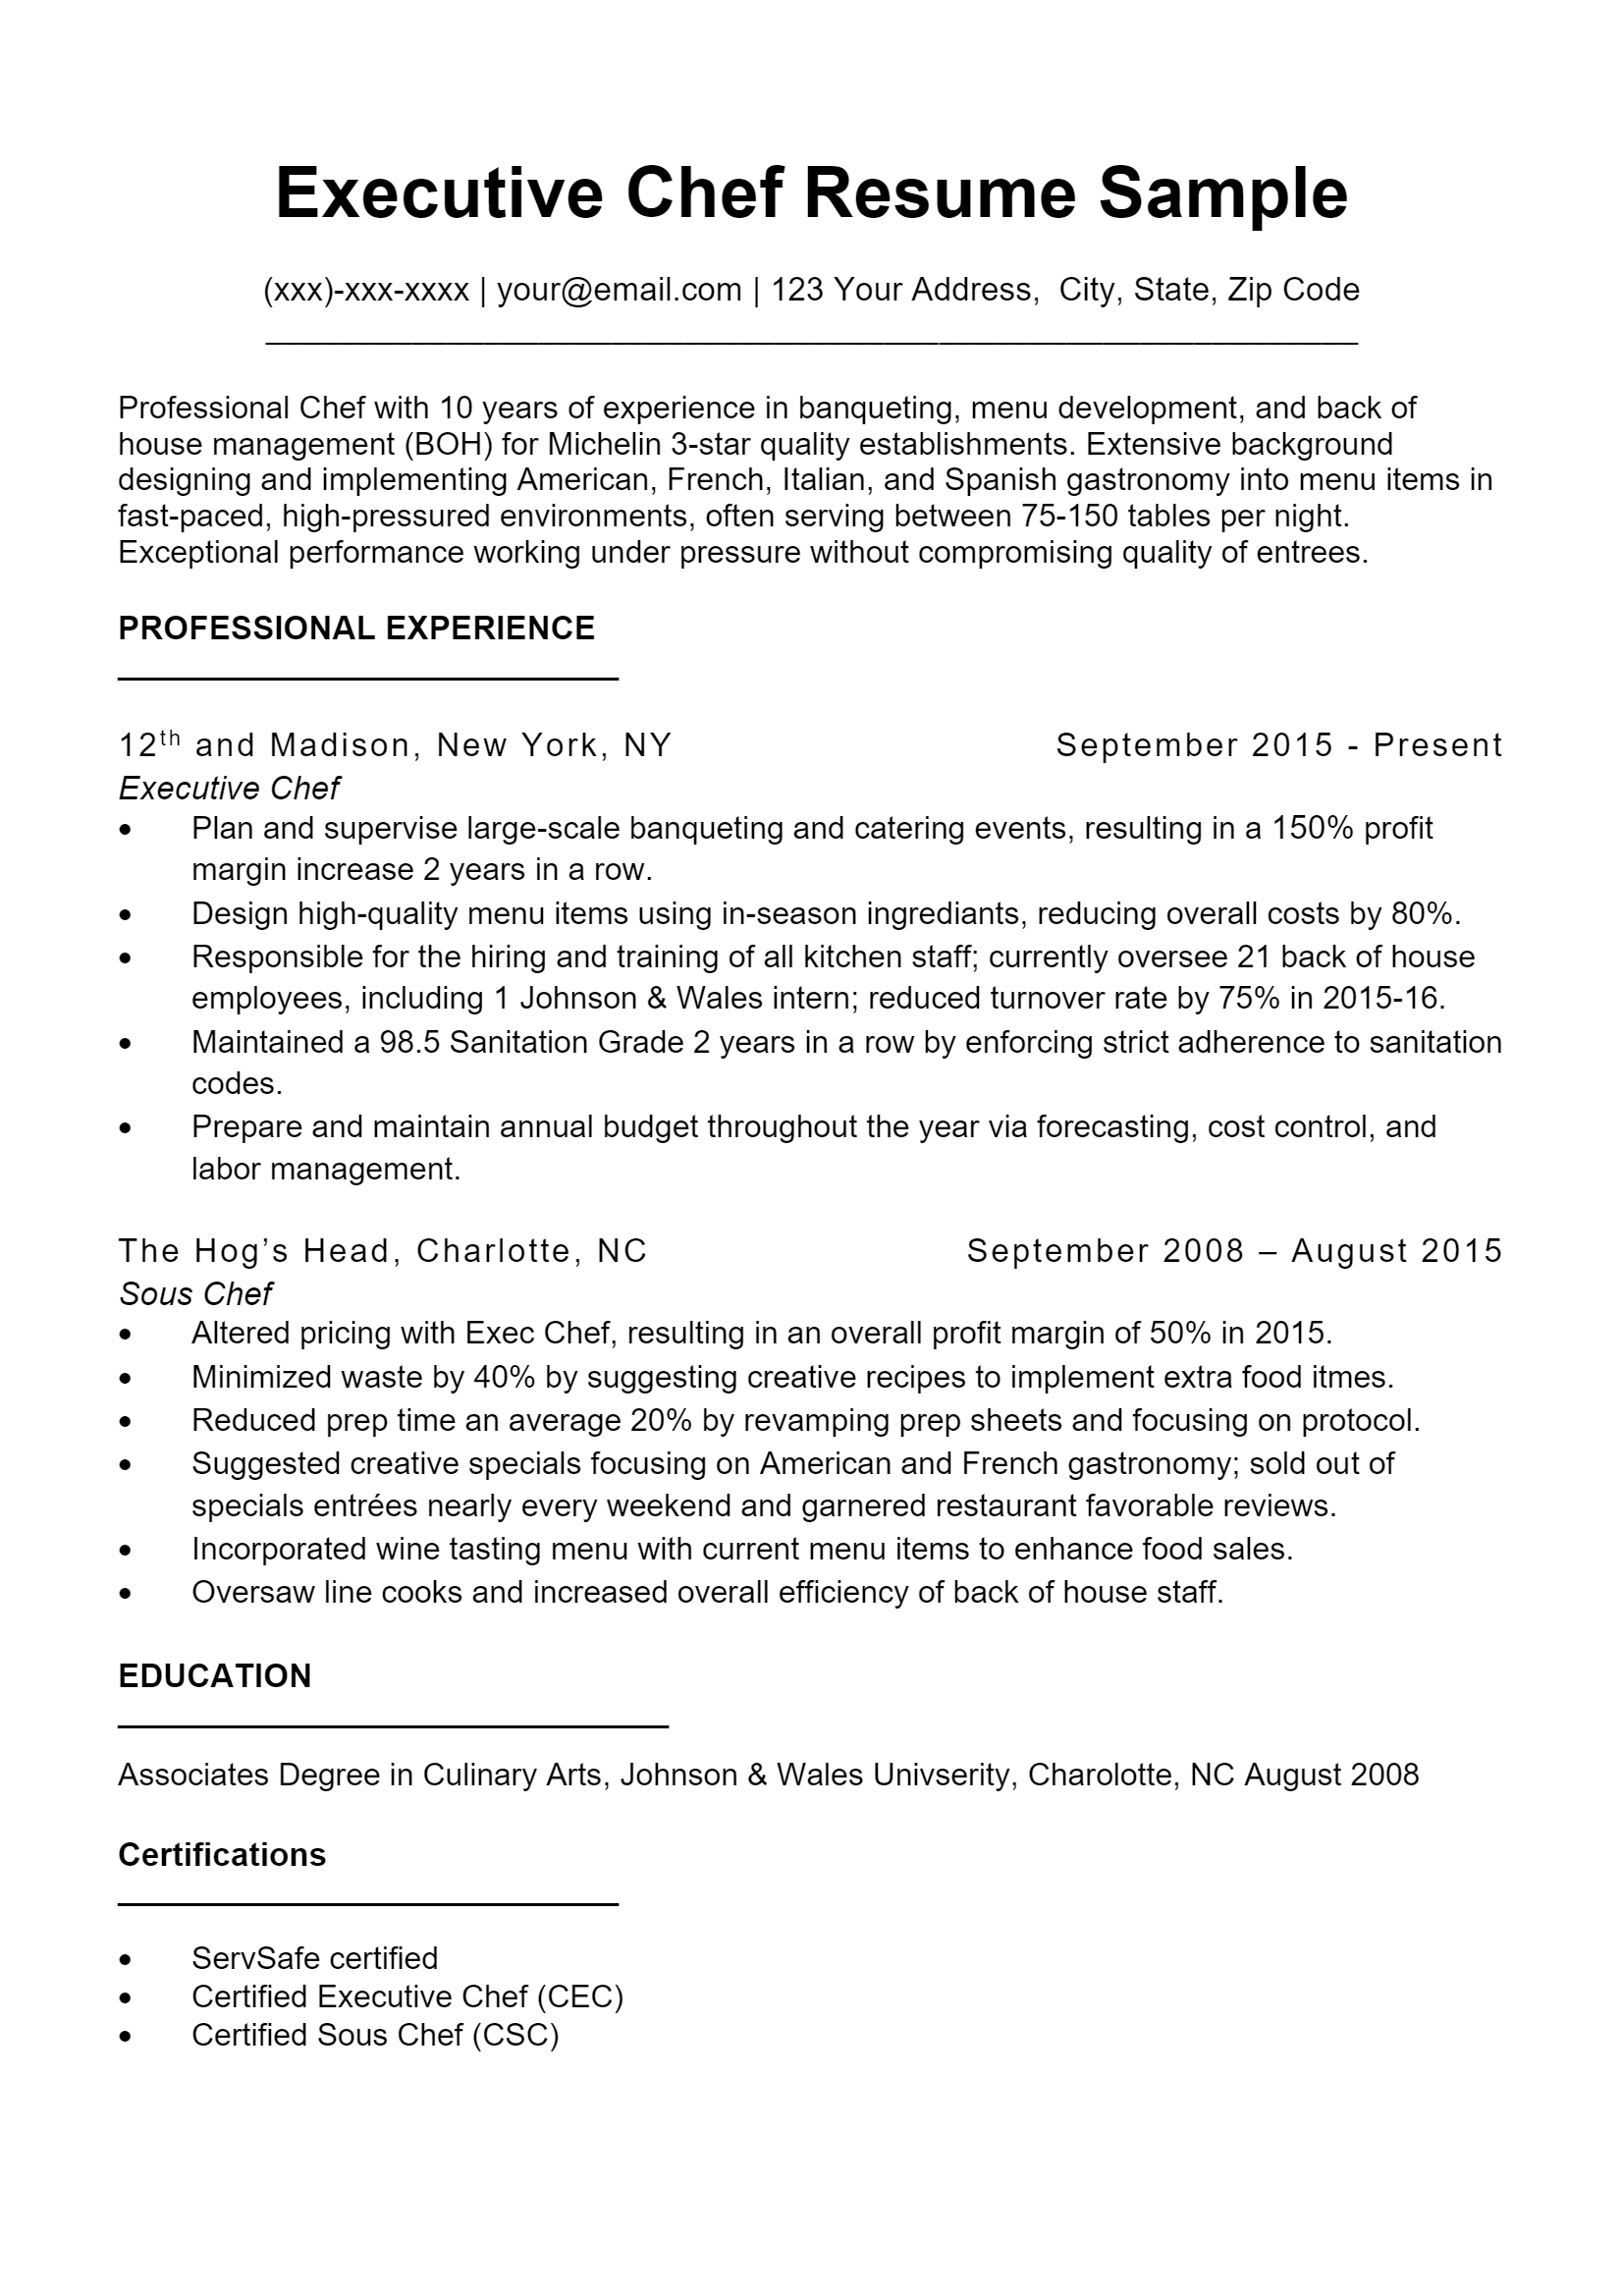 Executive Chef Resume > Executive Chef Resume .Docx (Word)